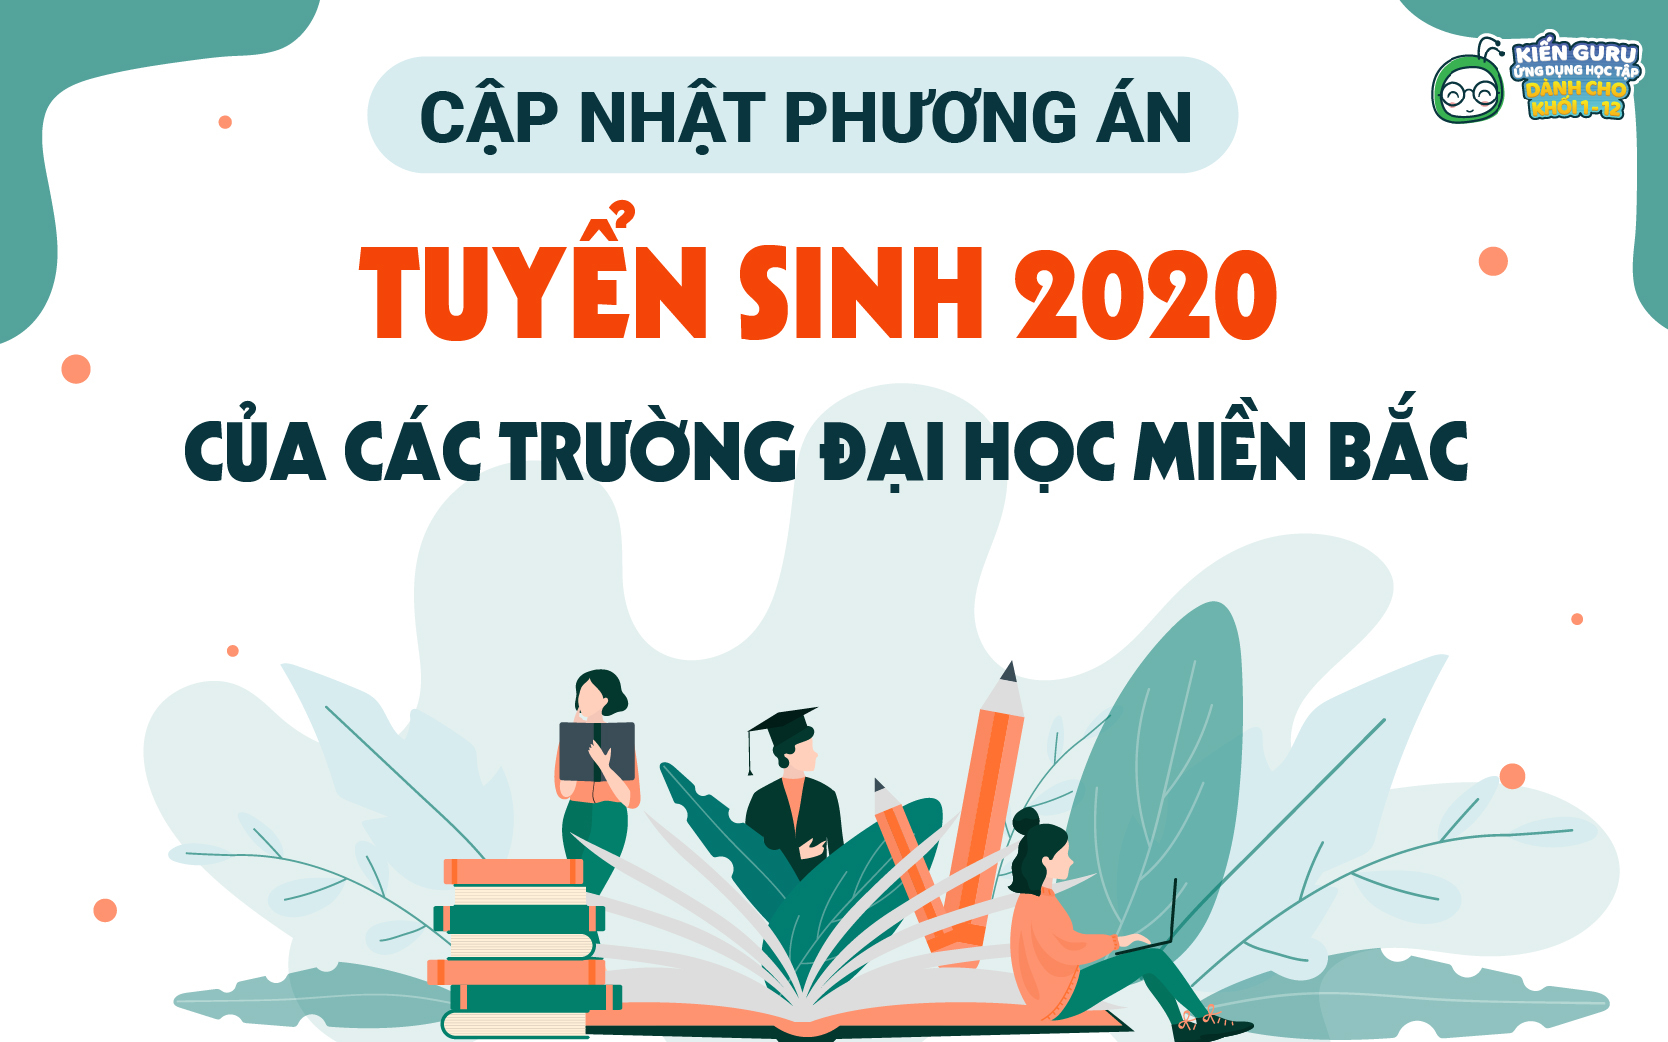 phuong-an-tuyen-sinh-2020-mien-bac